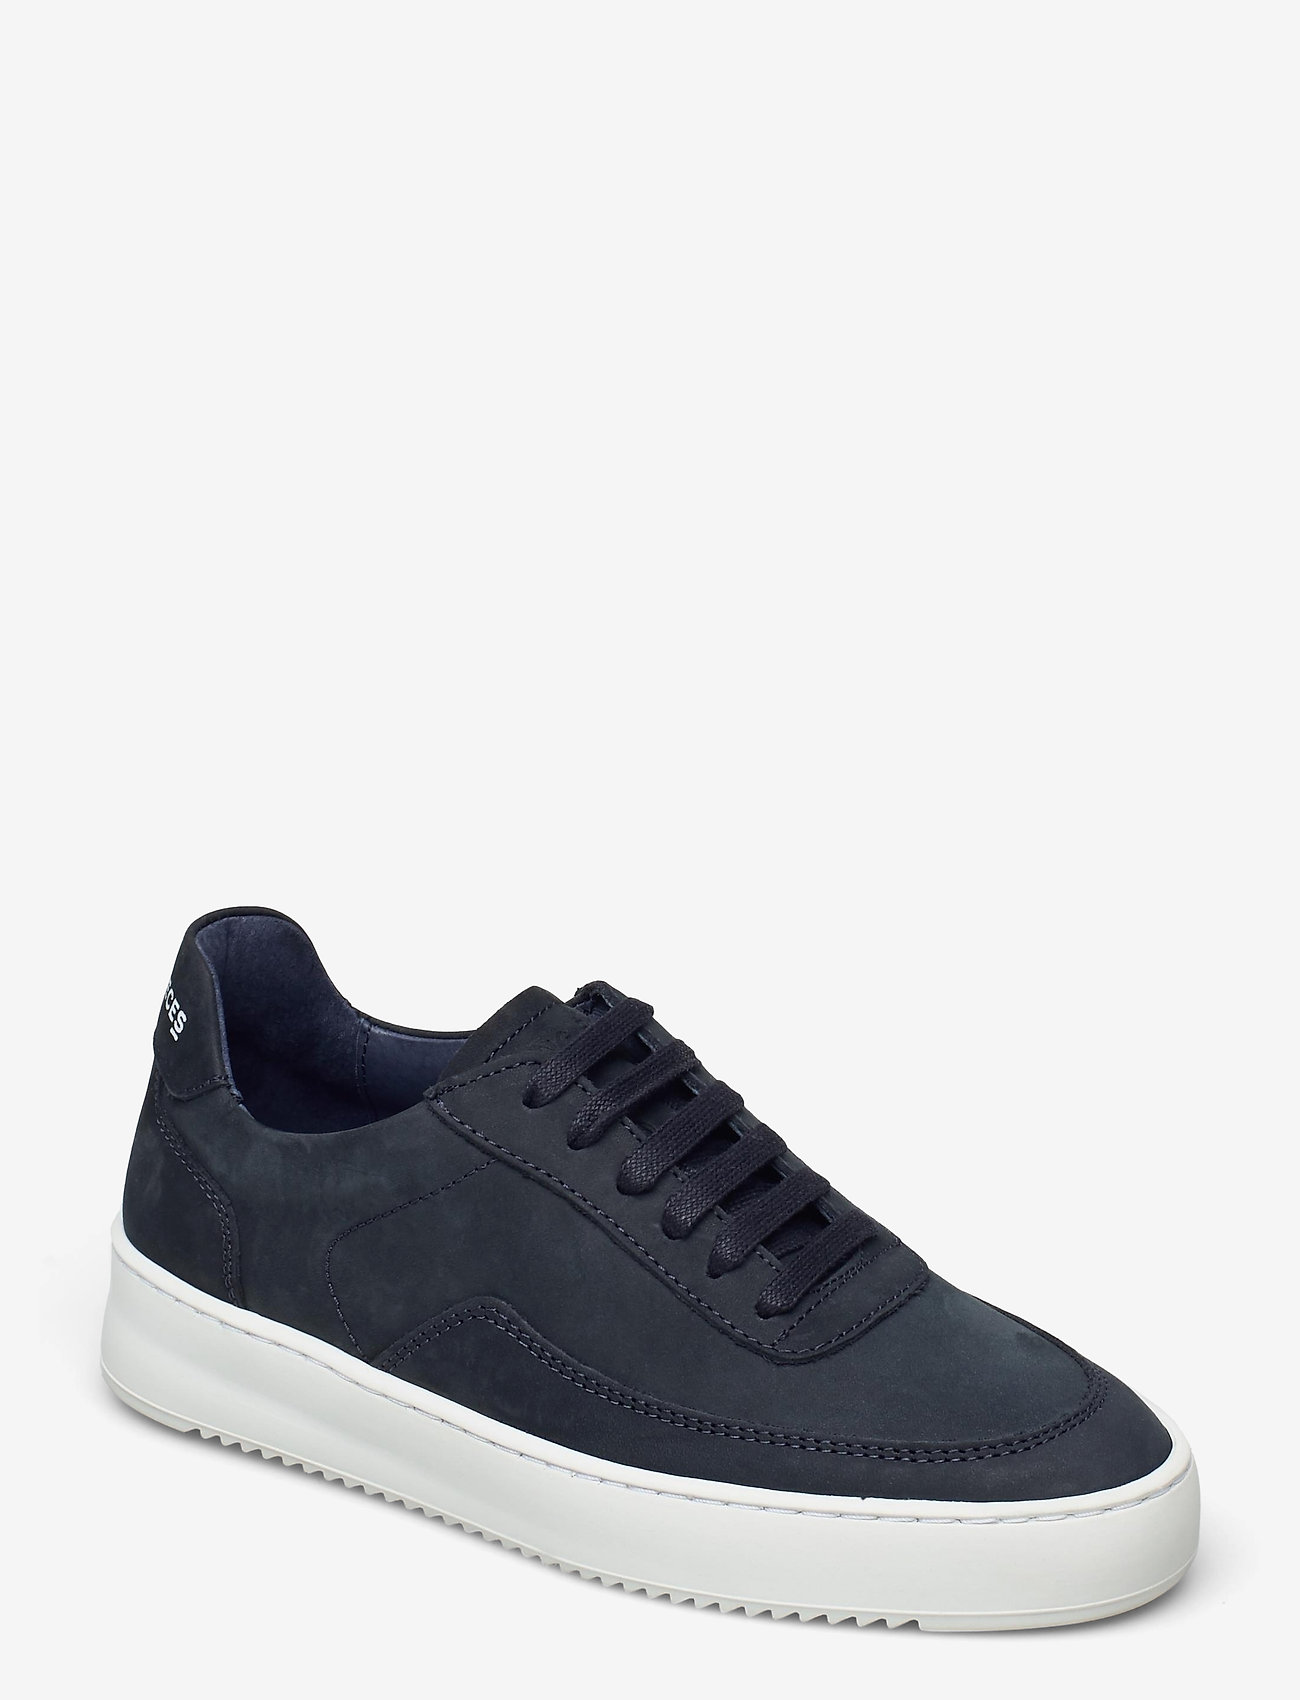 Filling Pieces - Mondo 2.0 Ripple Nubuck - låga sneakers - navy blue - 1